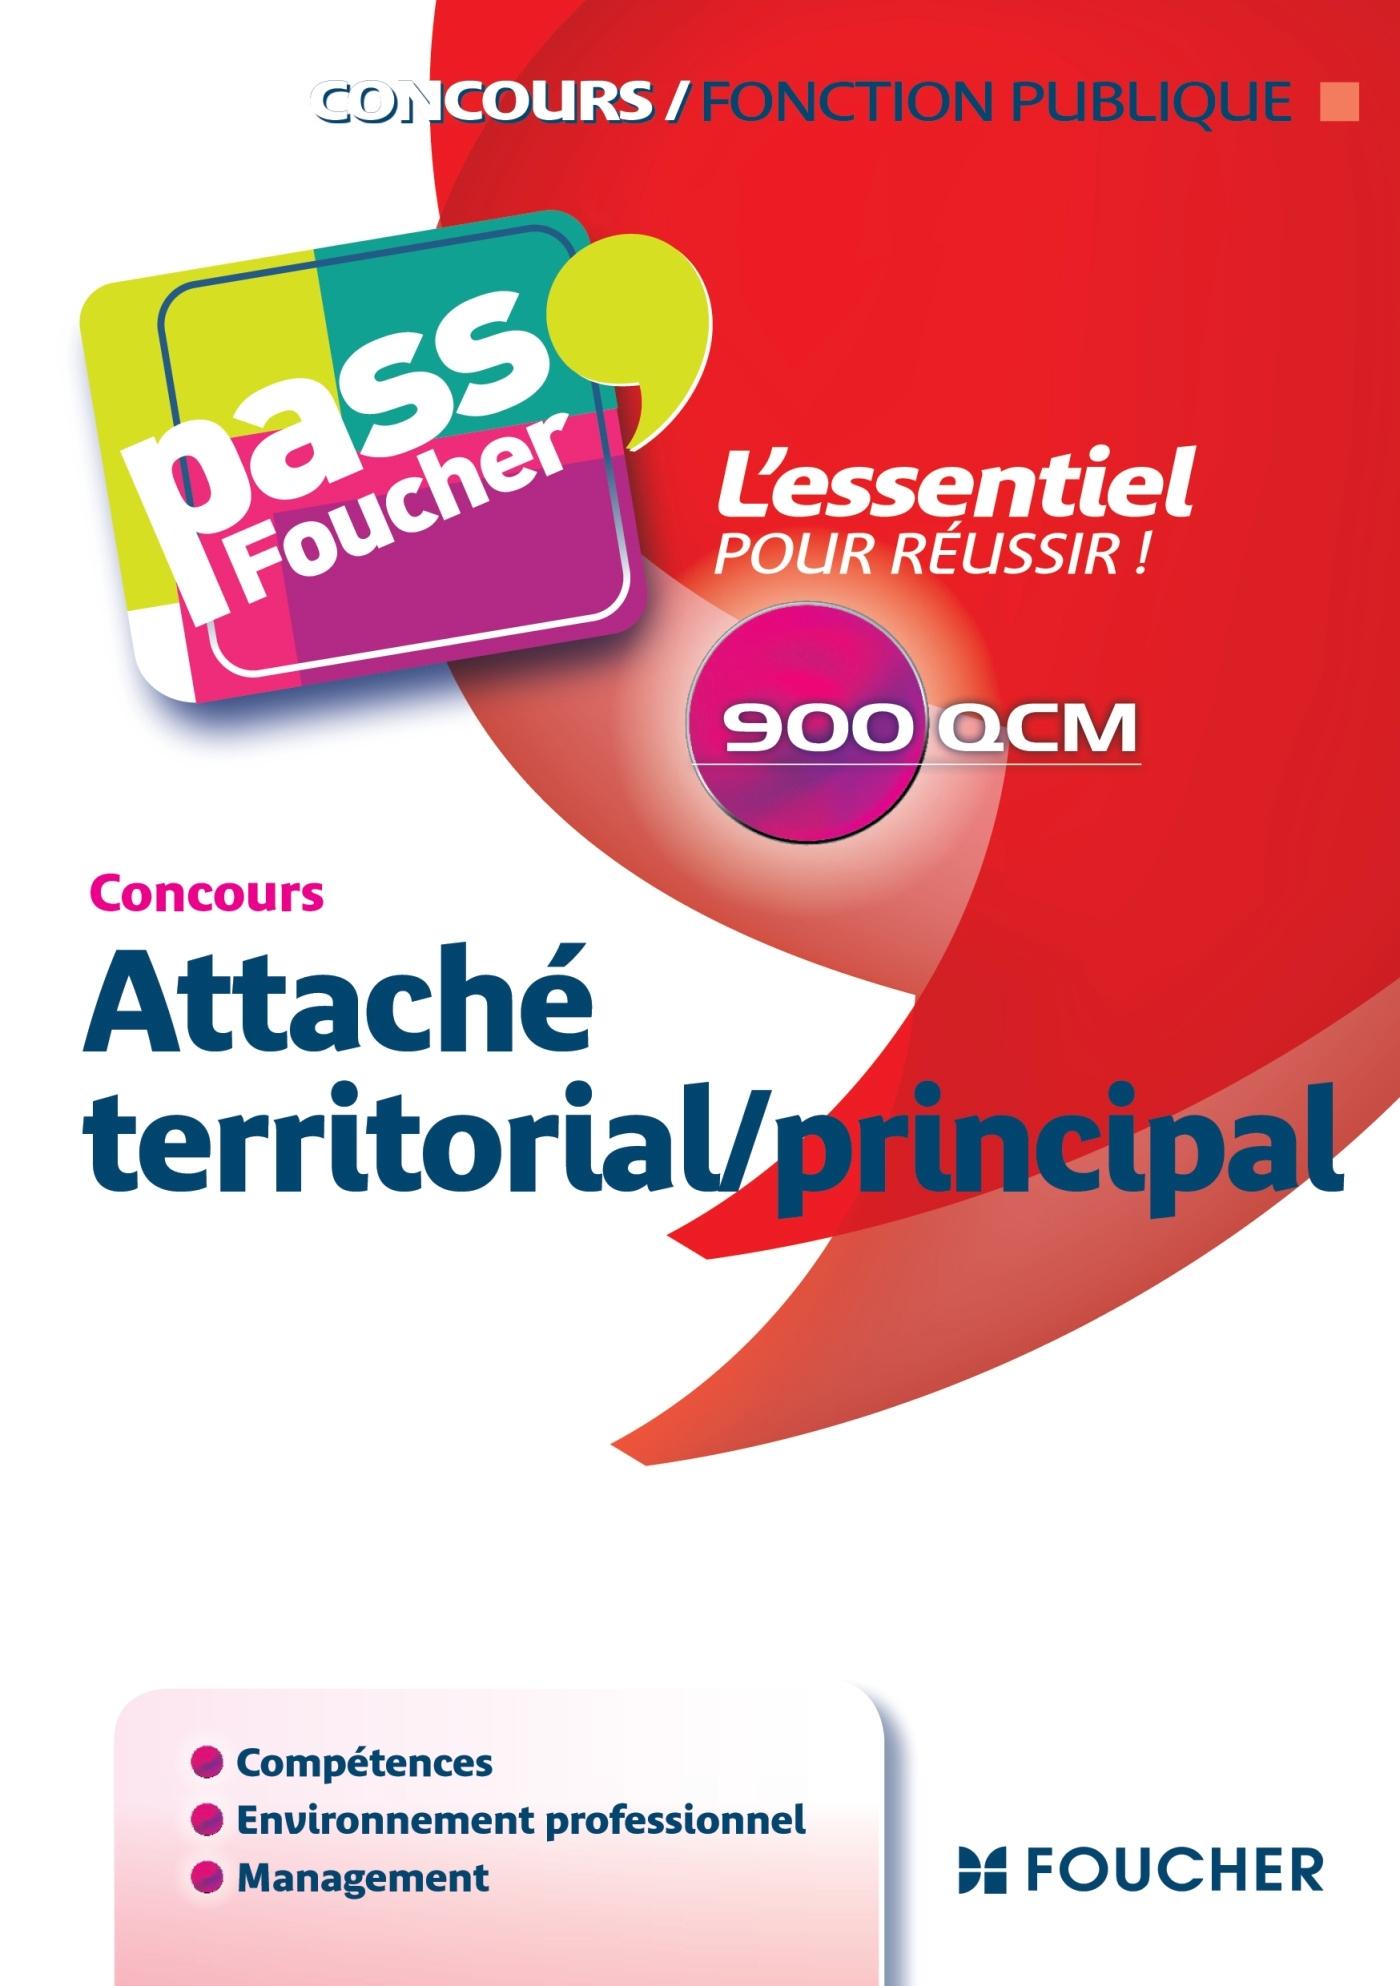 PASS'FOUCHER - ATTACHE TERRITORIAL/PRINCIPAL